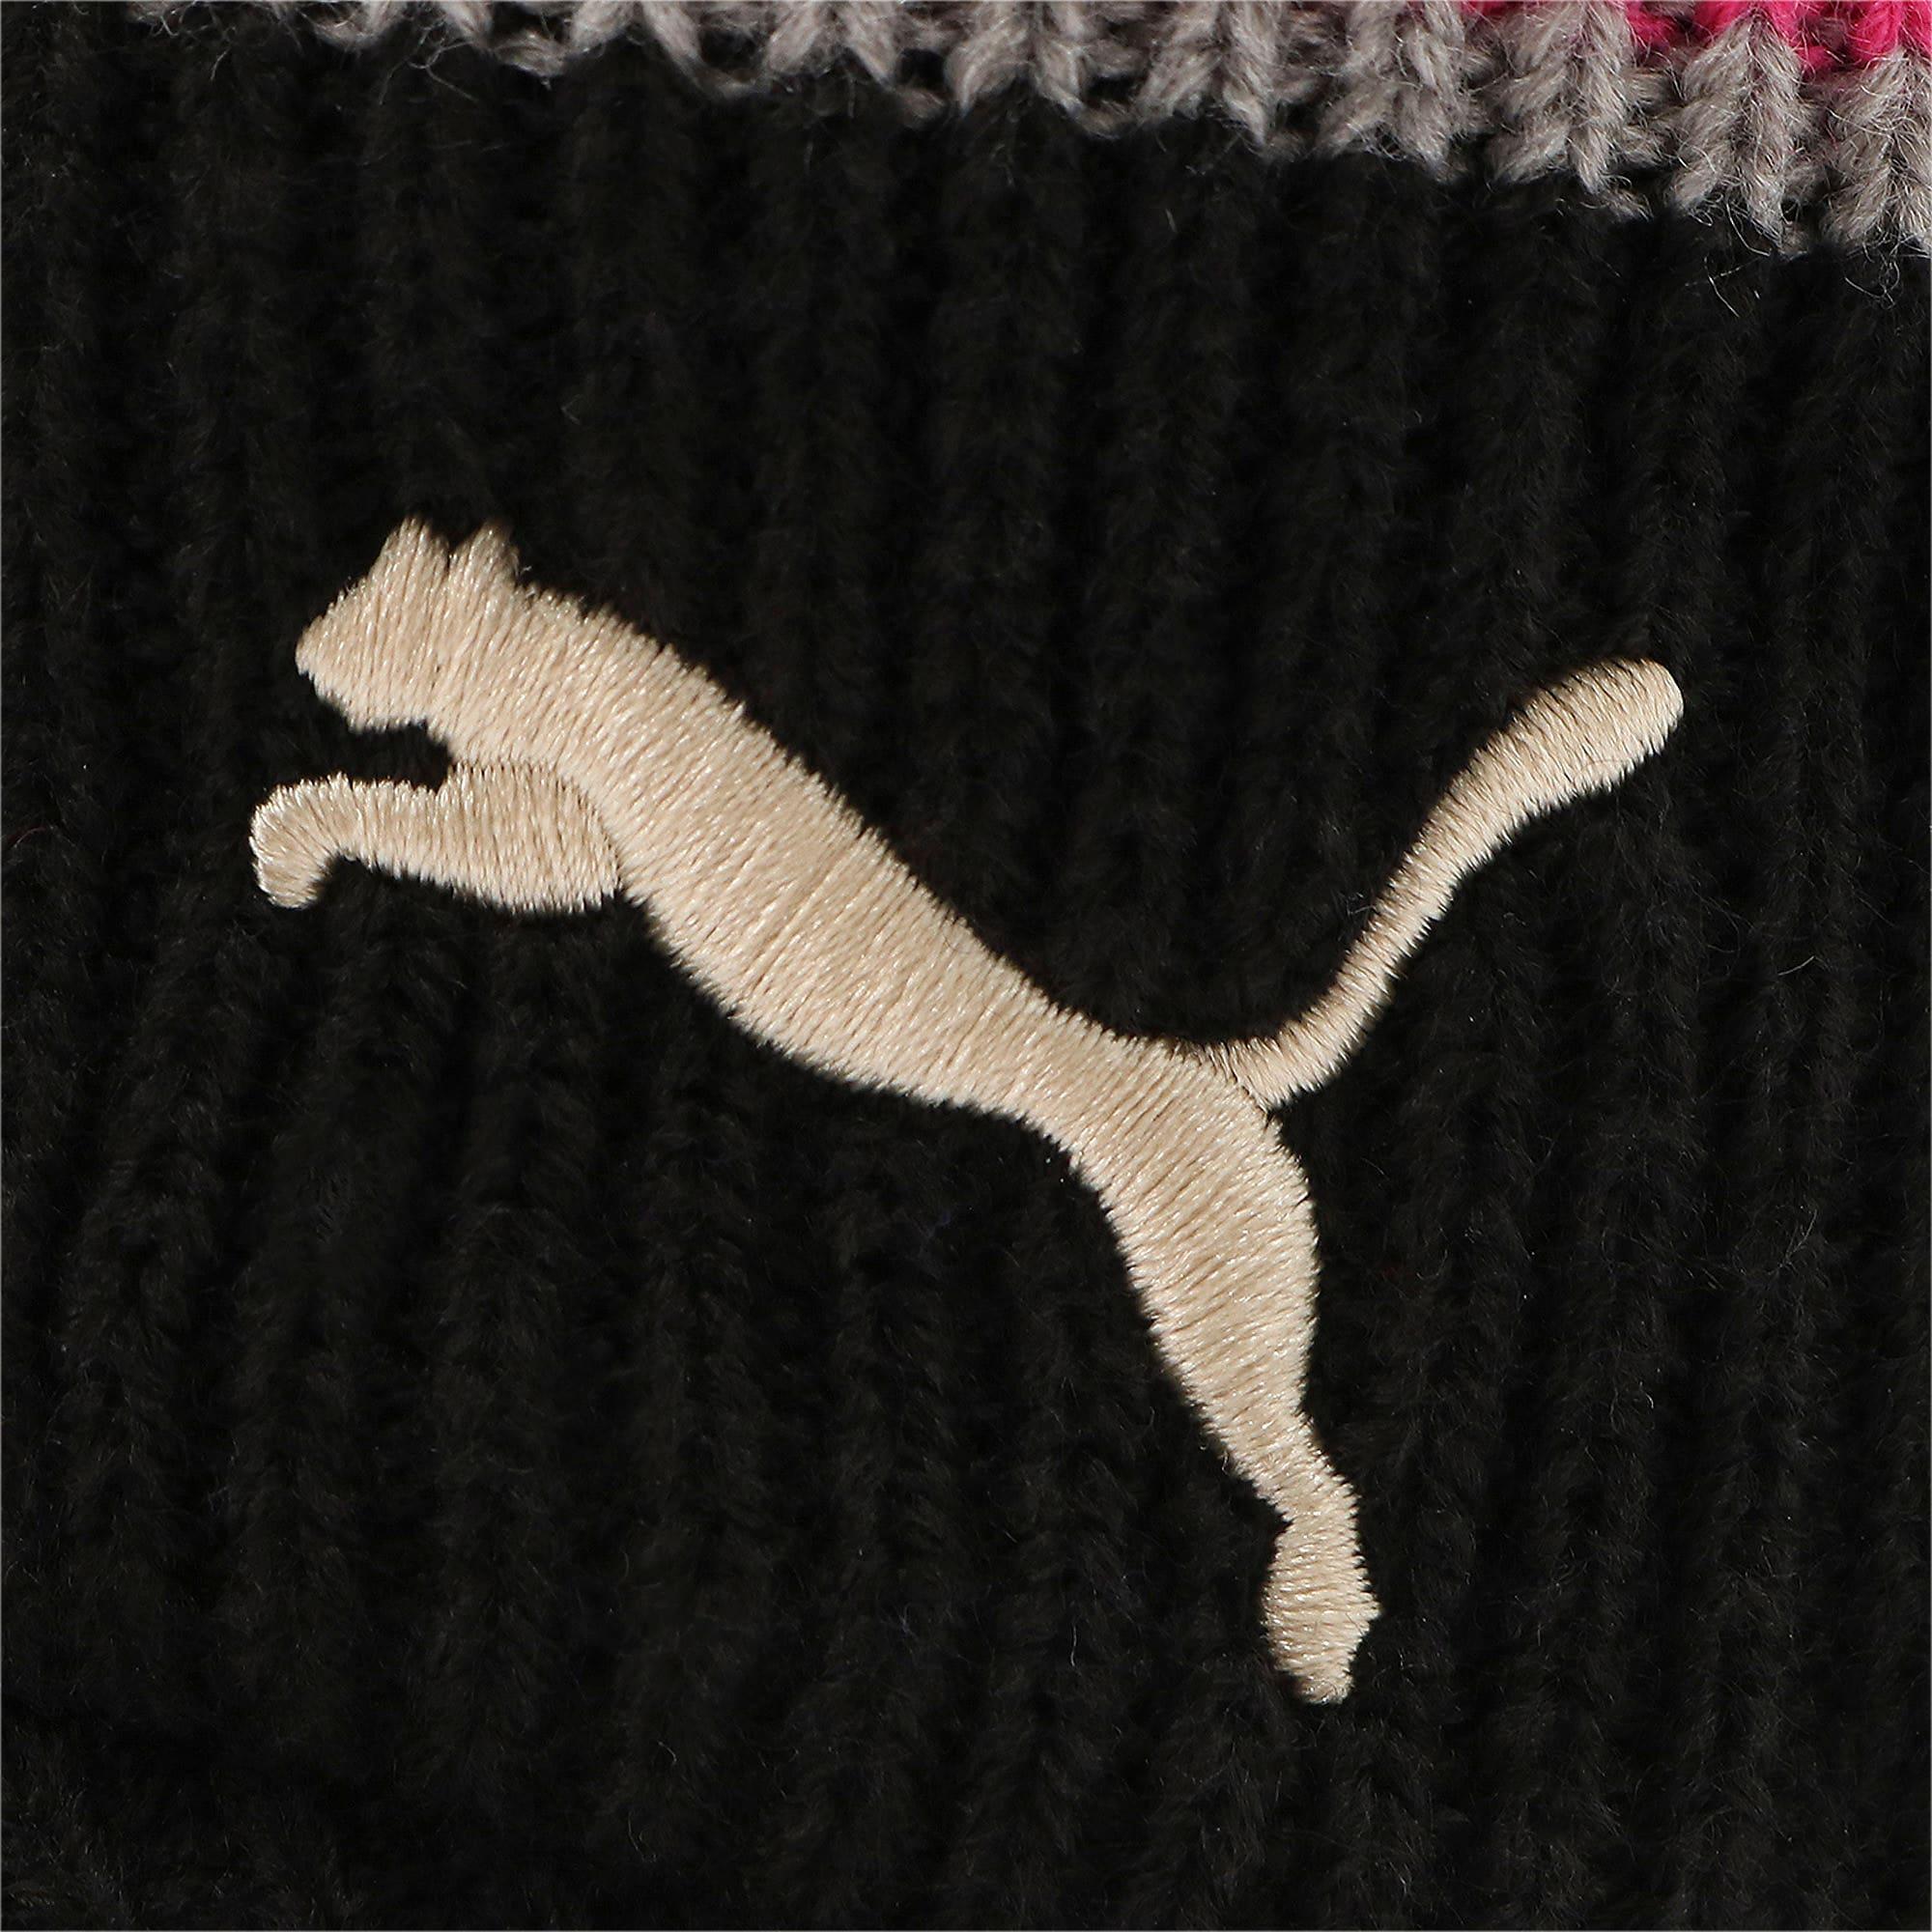 Thumbnail 3 of ゴルフ ウィメンズ ブリム ビーニー, Puma Black, medium-JPN